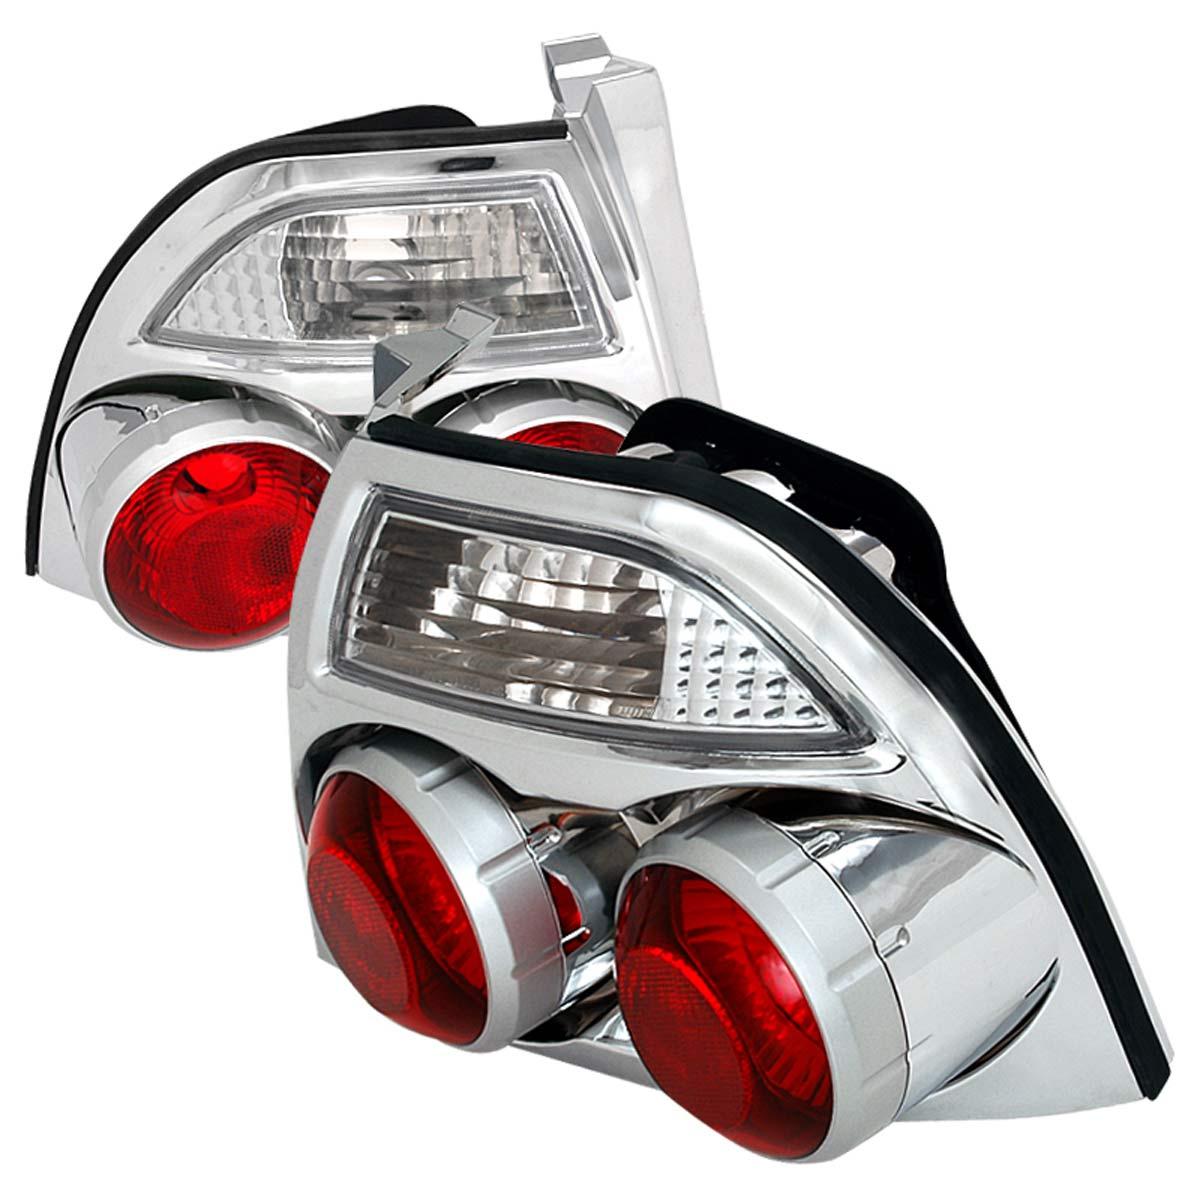 Spec-D Tuning LT-ACD94-GN - Spec-D 94-95 Accord Jdm Skyline Taillights - Chrome (lt-acd94-gn)